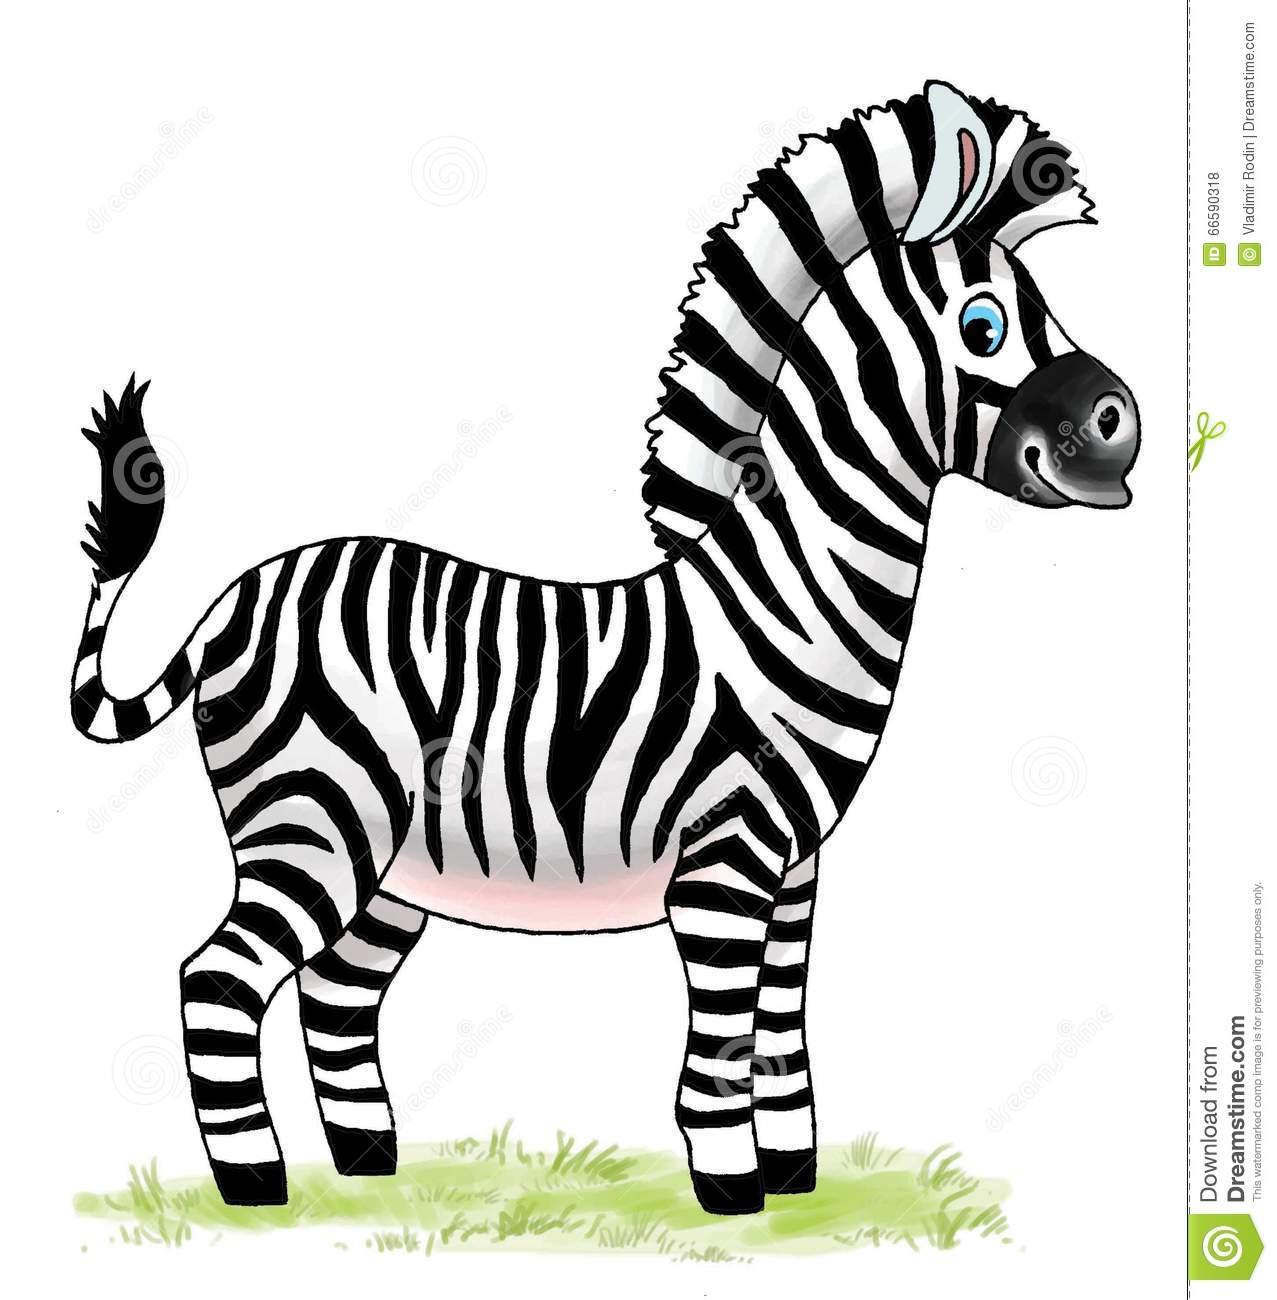 Zebra Horse African Zoo Cartoon Figure Stock Illustration